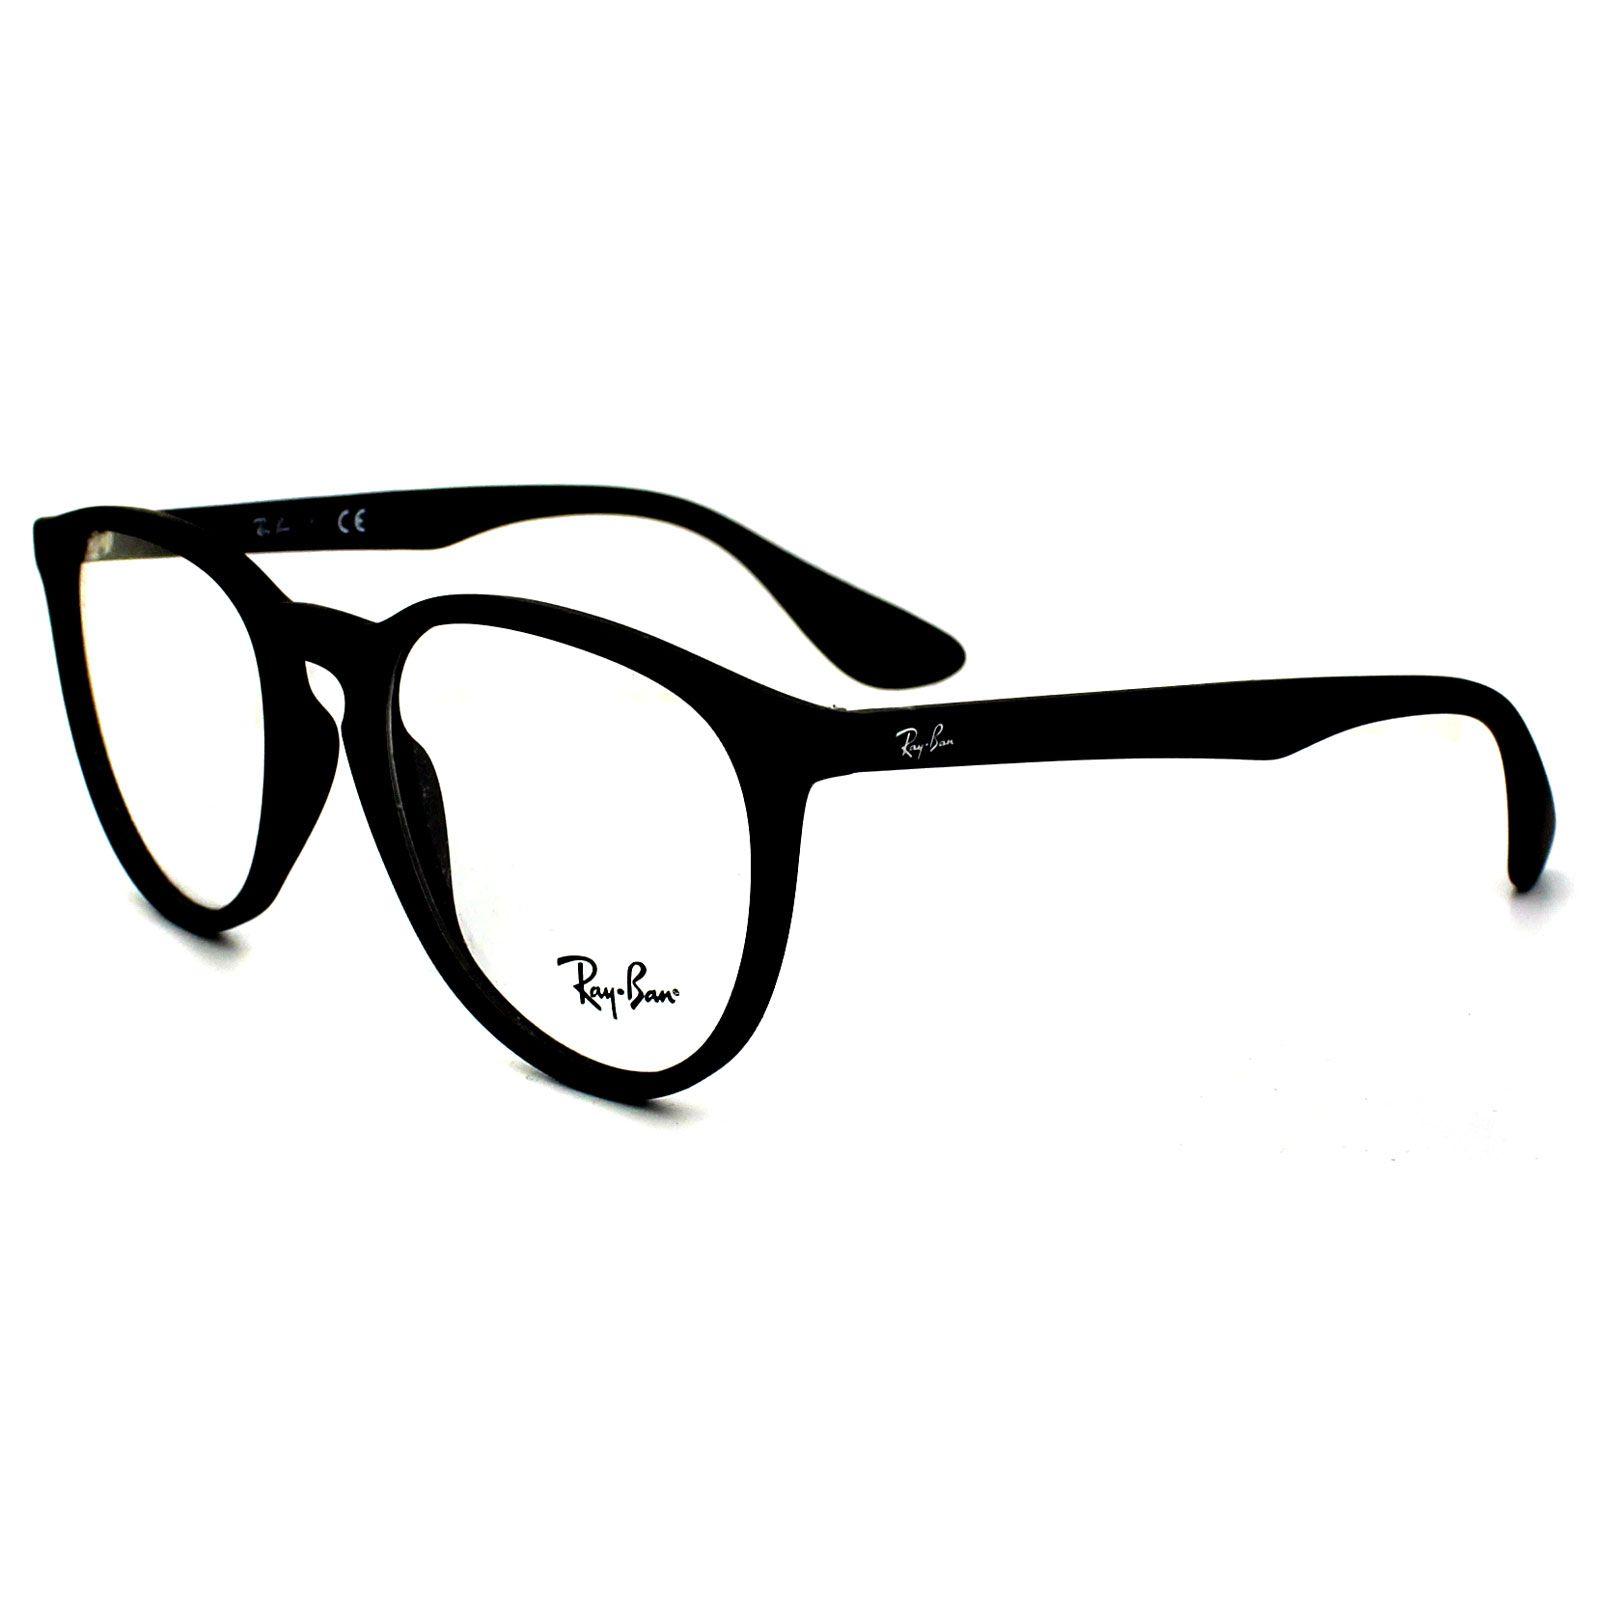 Género: Hombre Material: Pasta Color: Negro | Gafas de vista ...